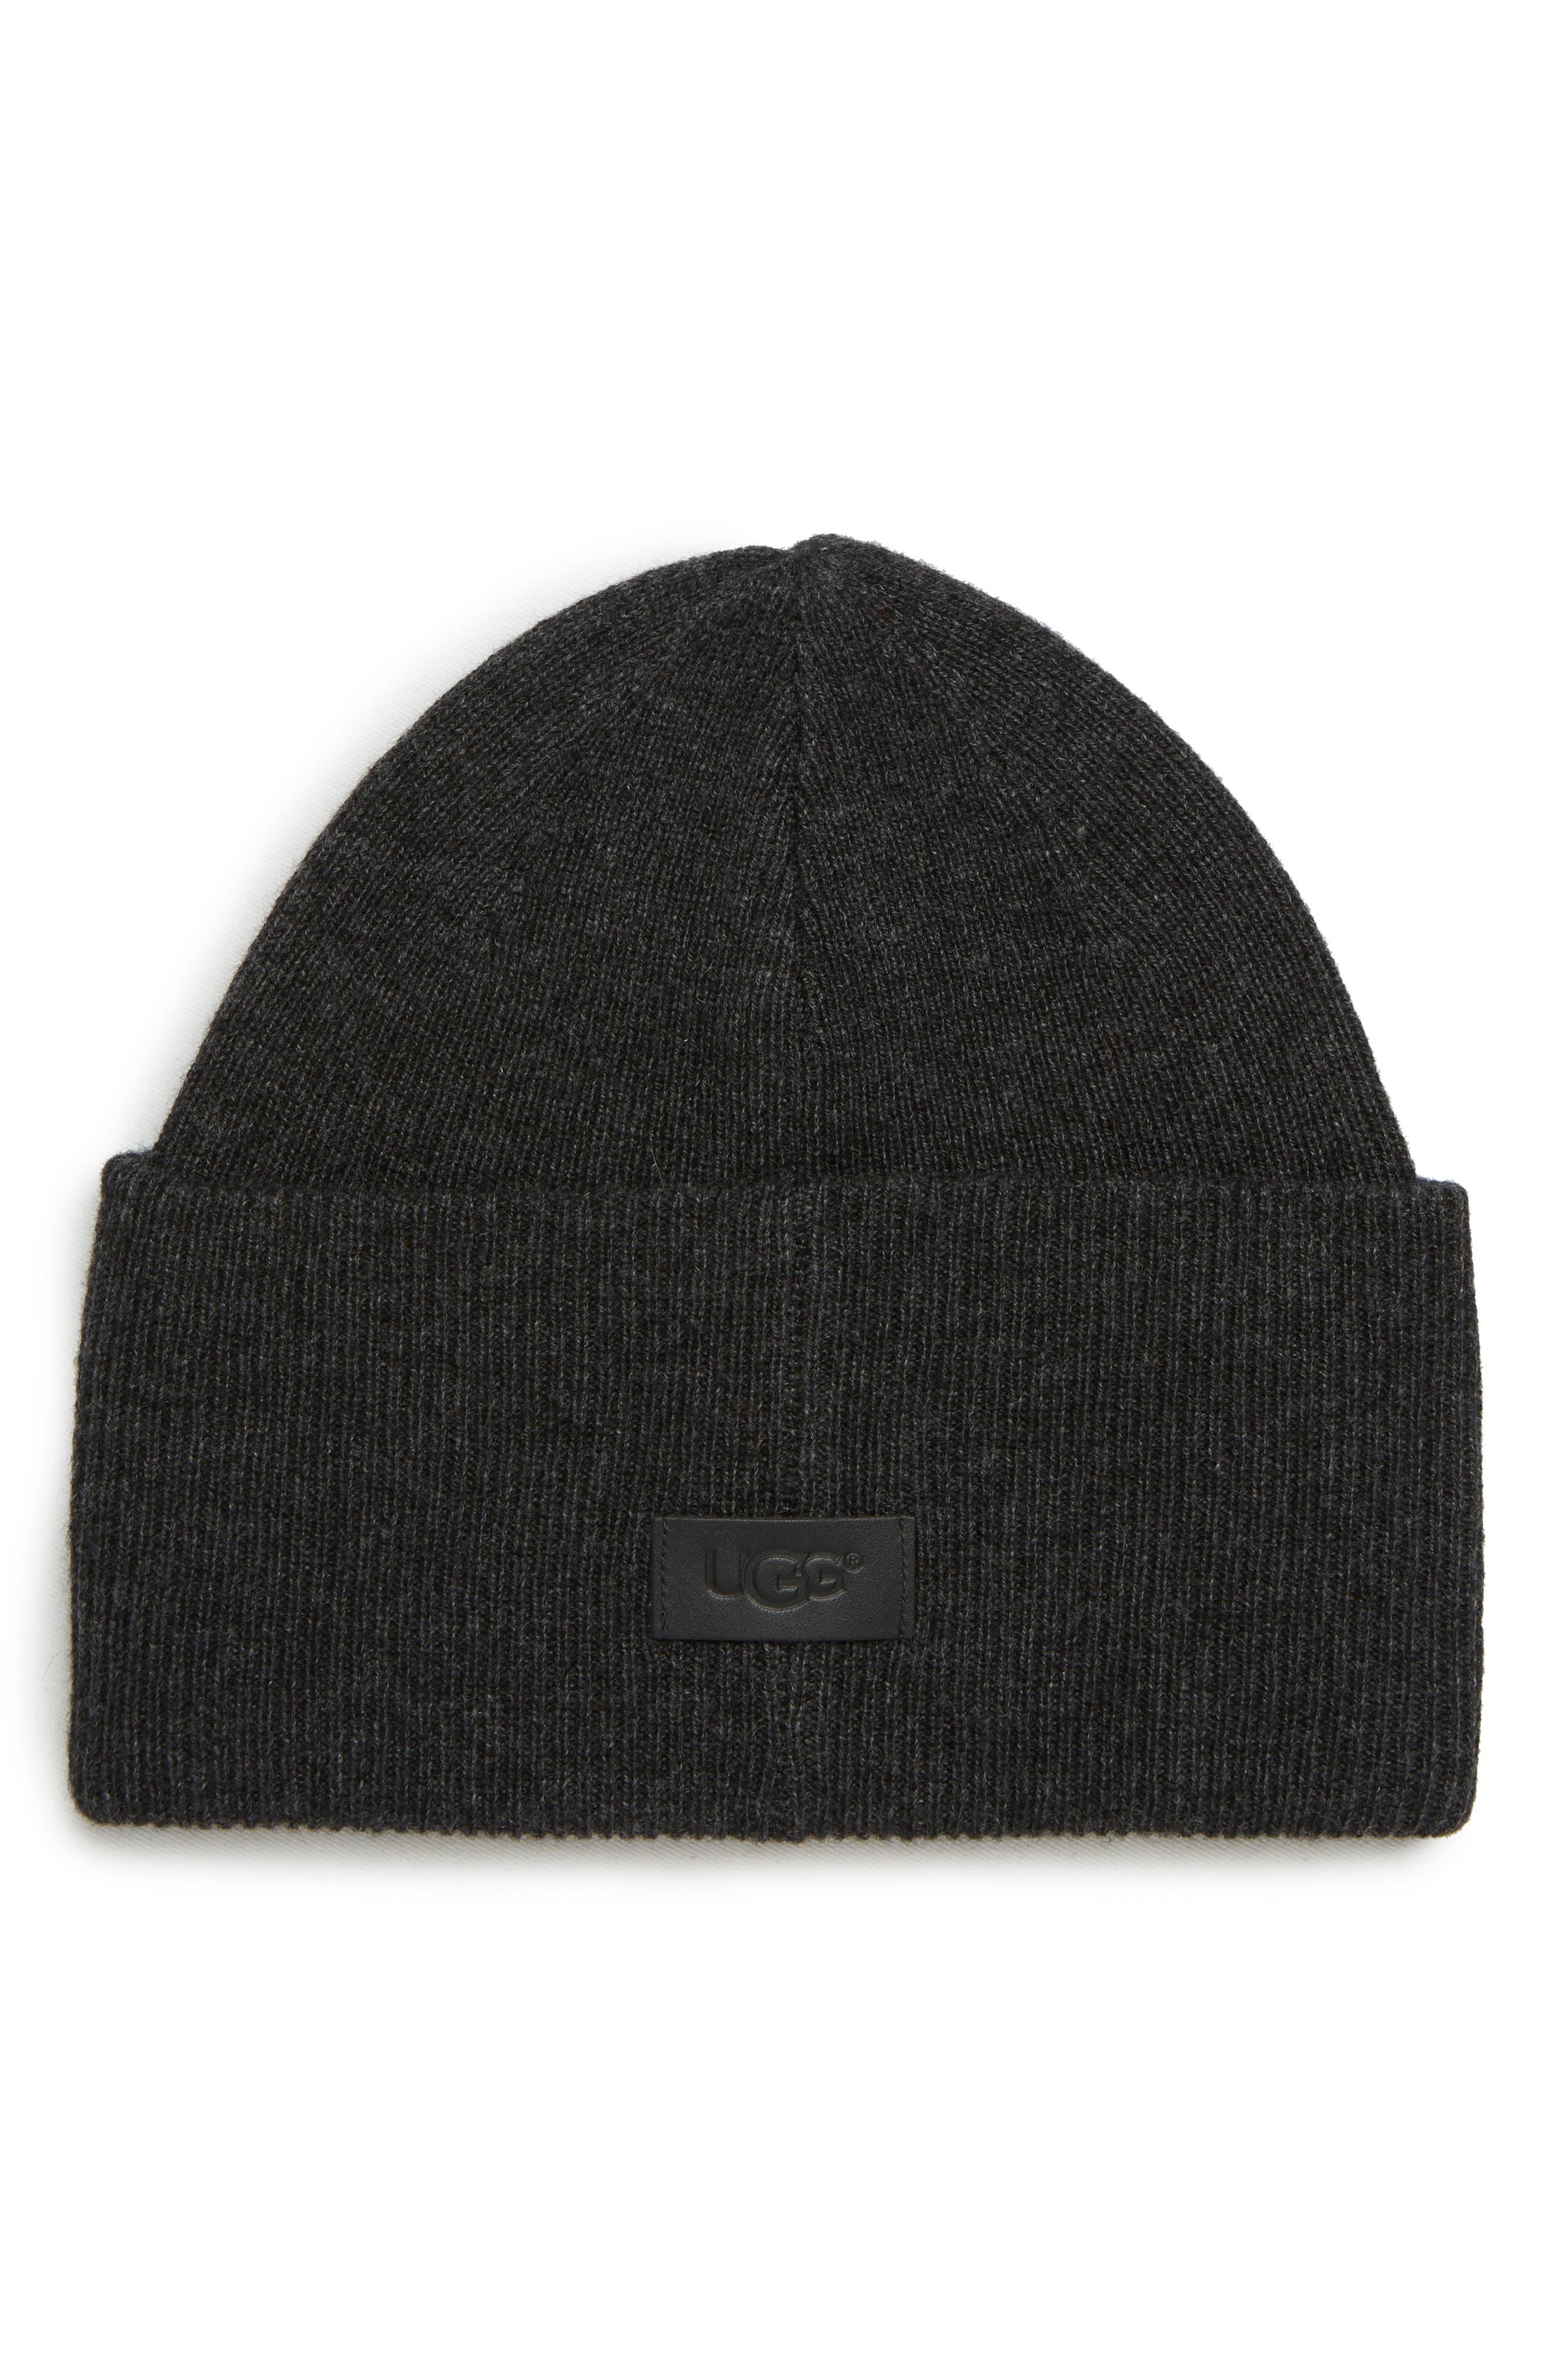 Ugg Beanies High Cuff Knit Wool & Cashmere Beanie